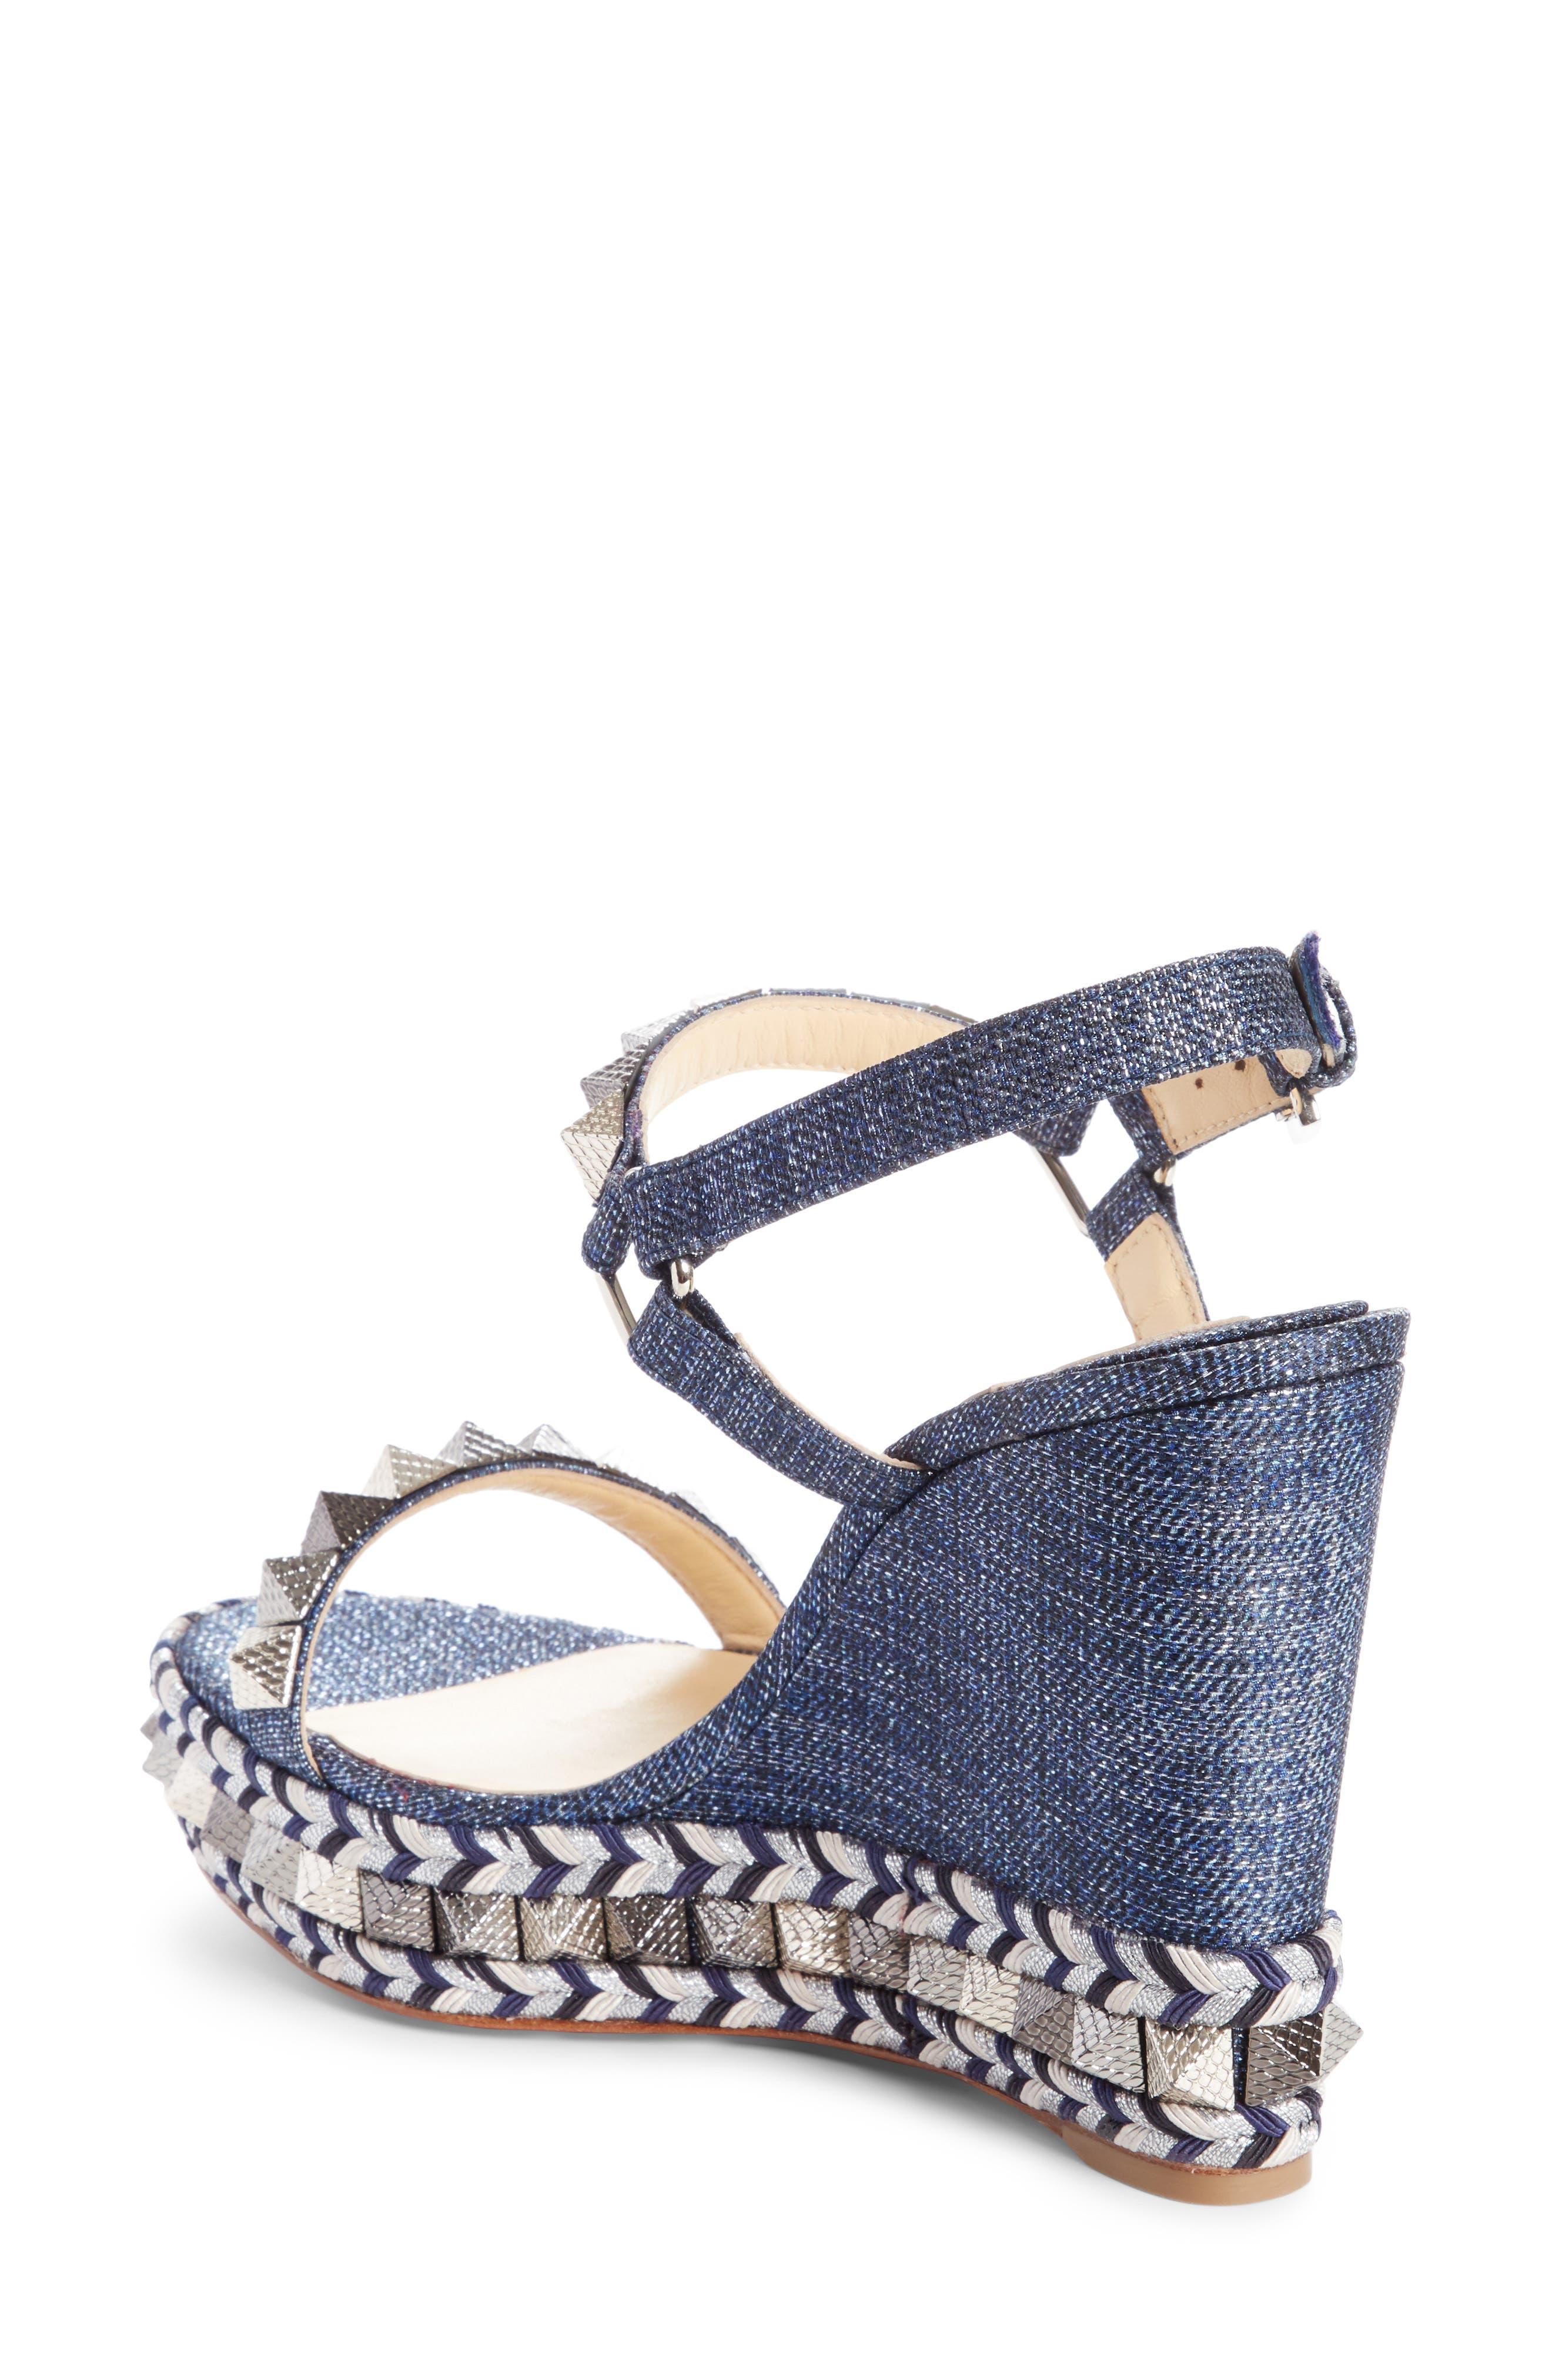 Pyraclou Studded Platform Wedge Sandal,                             Alternate thumbnail 2, color,                             DENIM